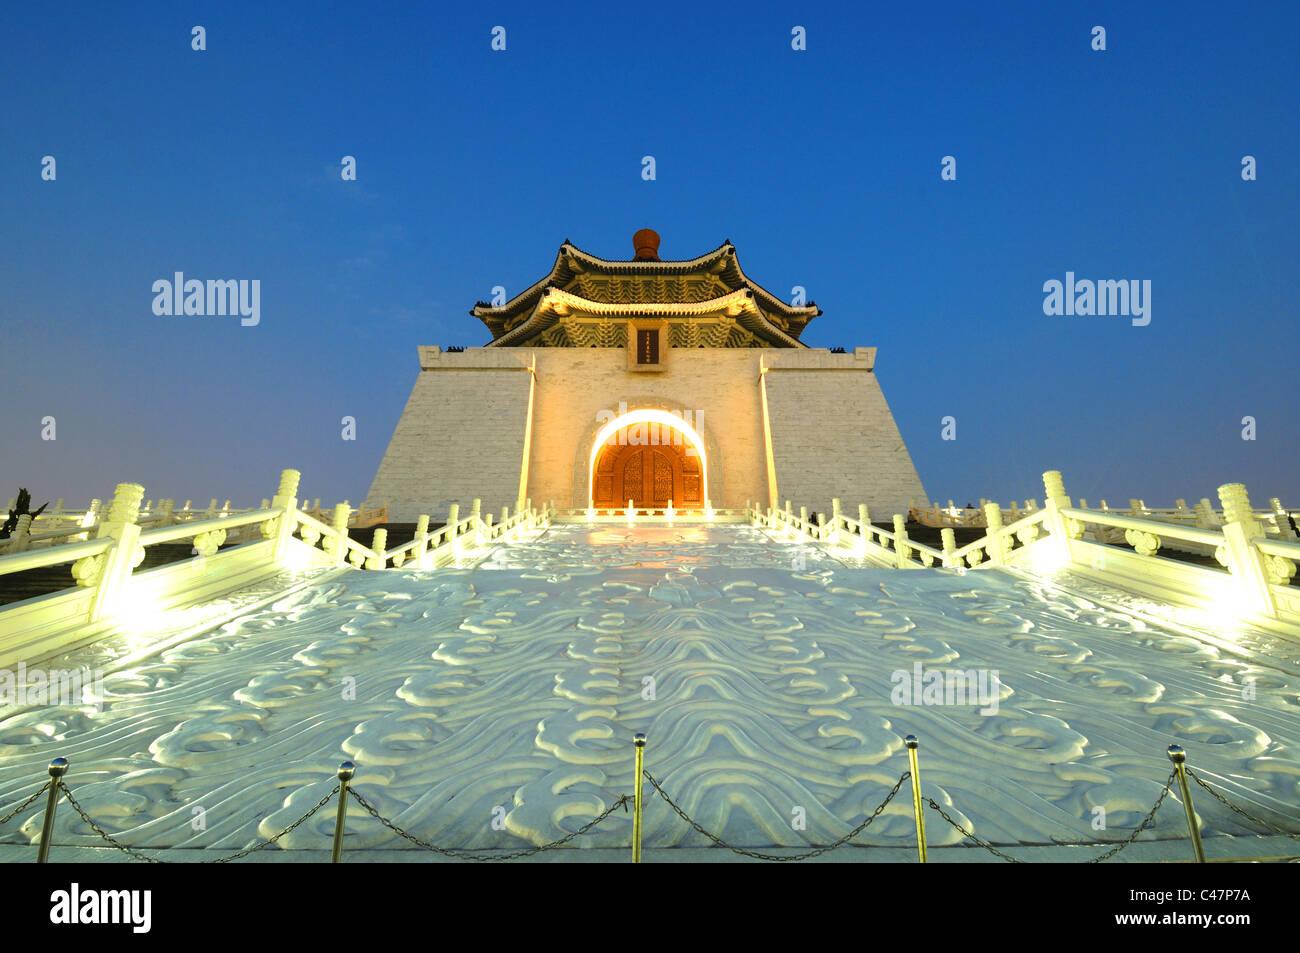 Facade of a memorial at night, Chiang Kaishek Memorial Hall, Taipei, Taiwan - Stock Image